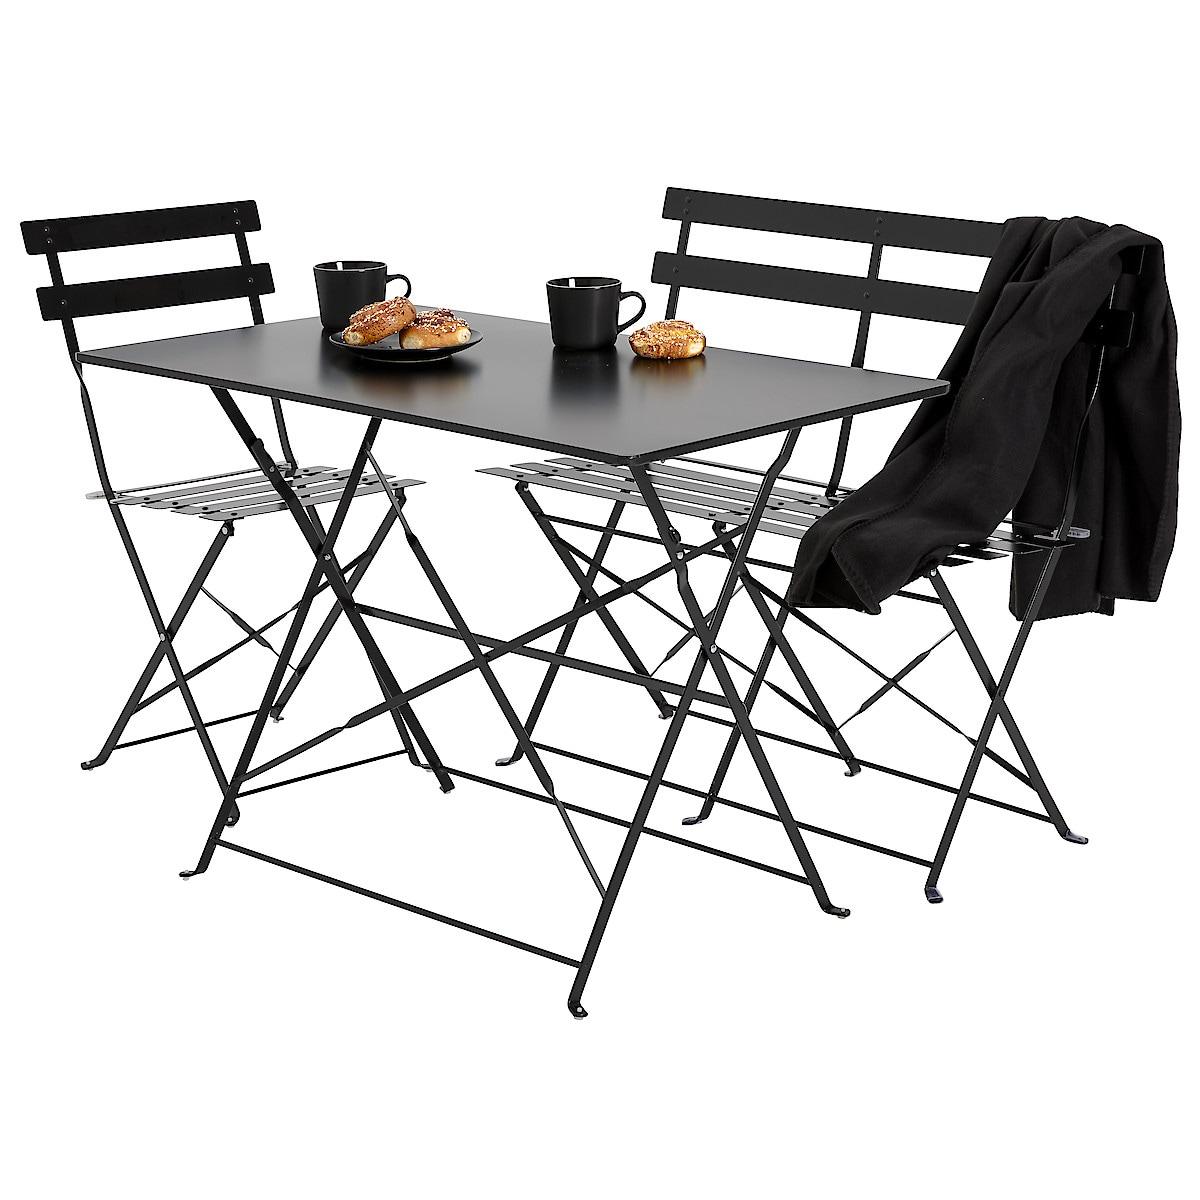 Hopfällbart bord, utemöbler metall